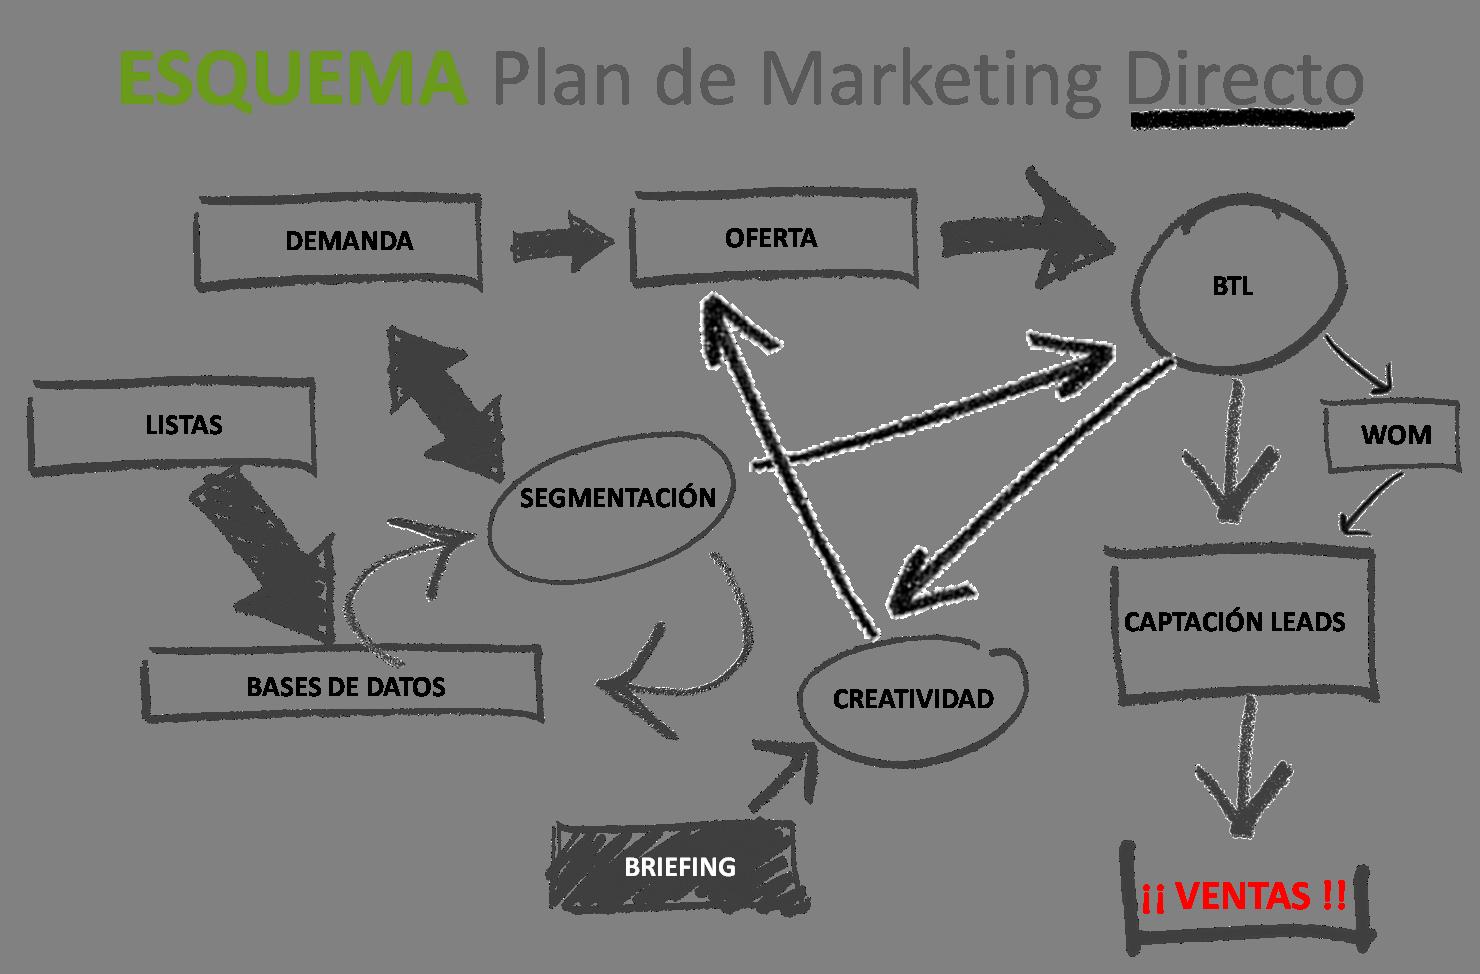 IEDGE-marketing-directo-4